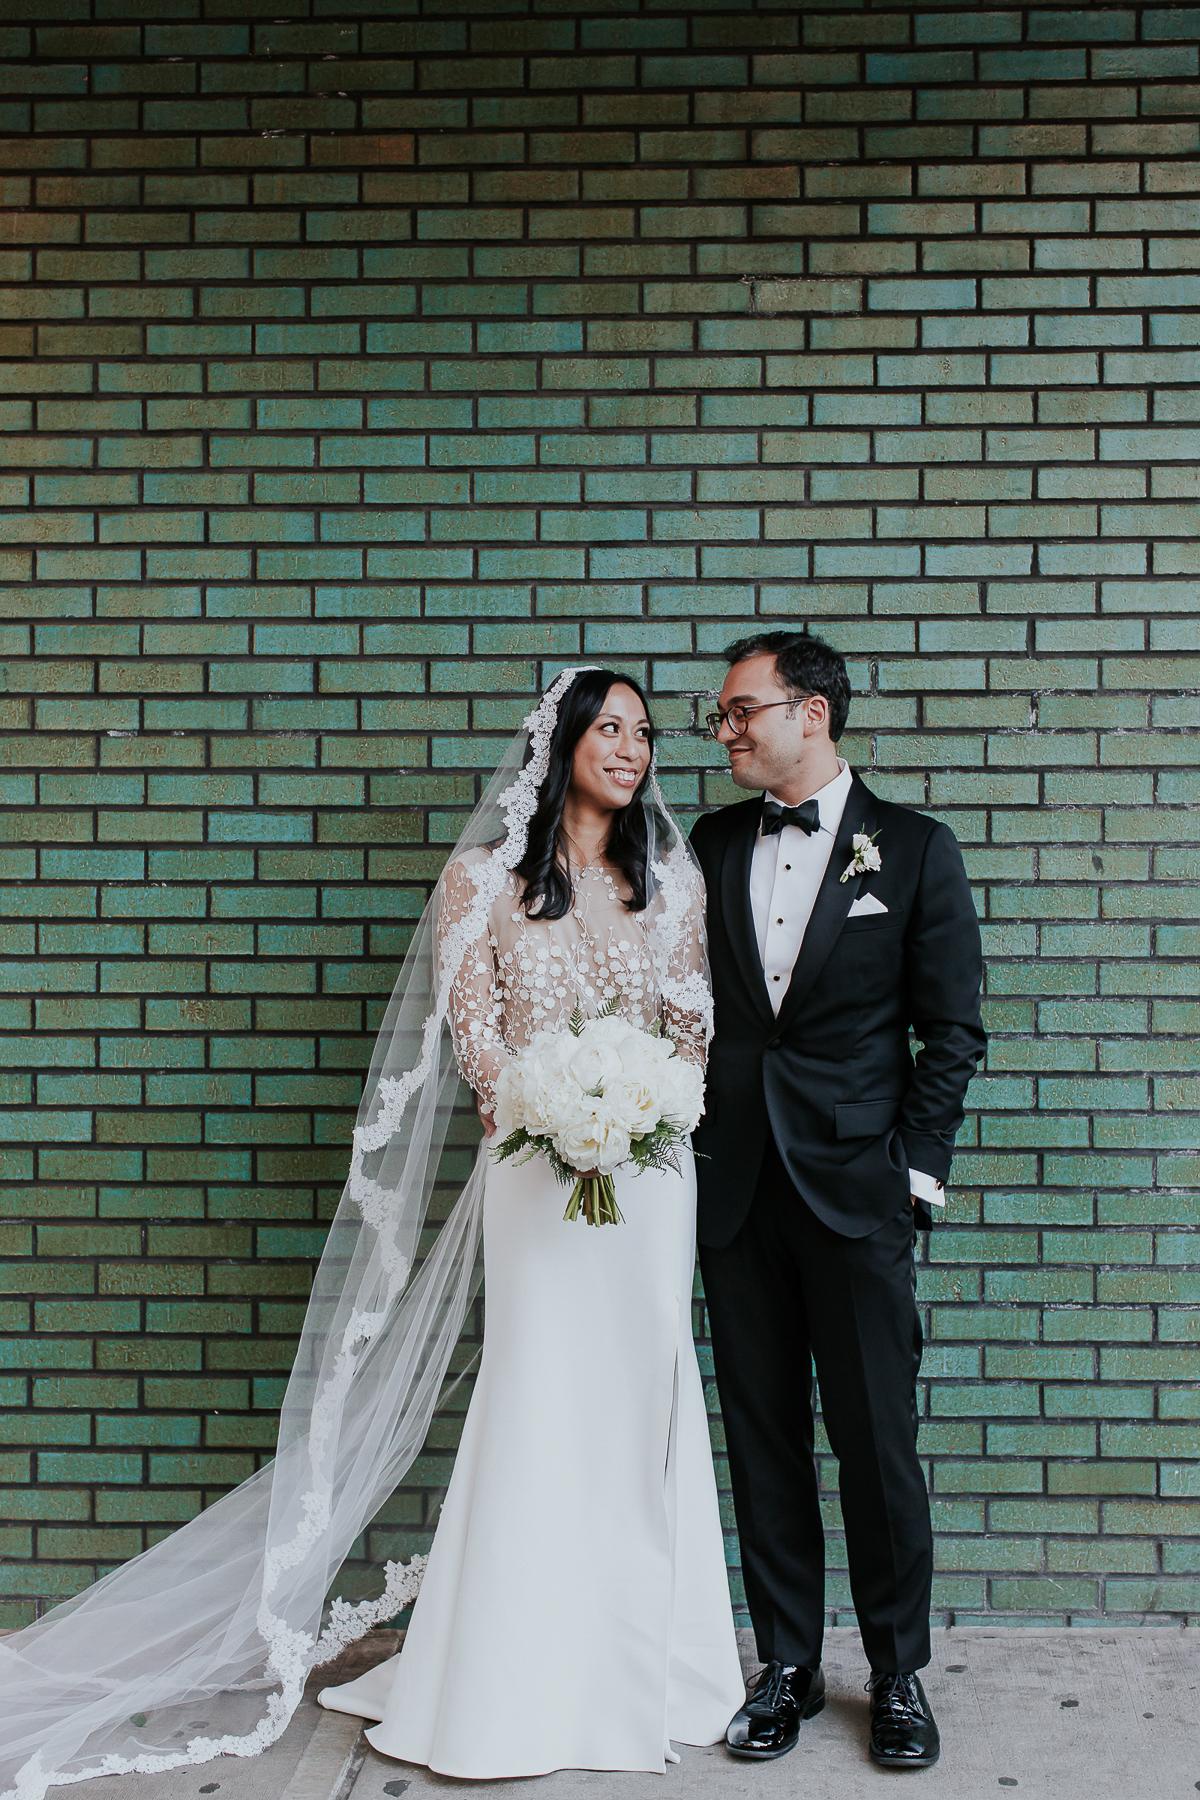 Bowery-Hotel-NYC-Documentary-Wedding-Photos-49.jpg